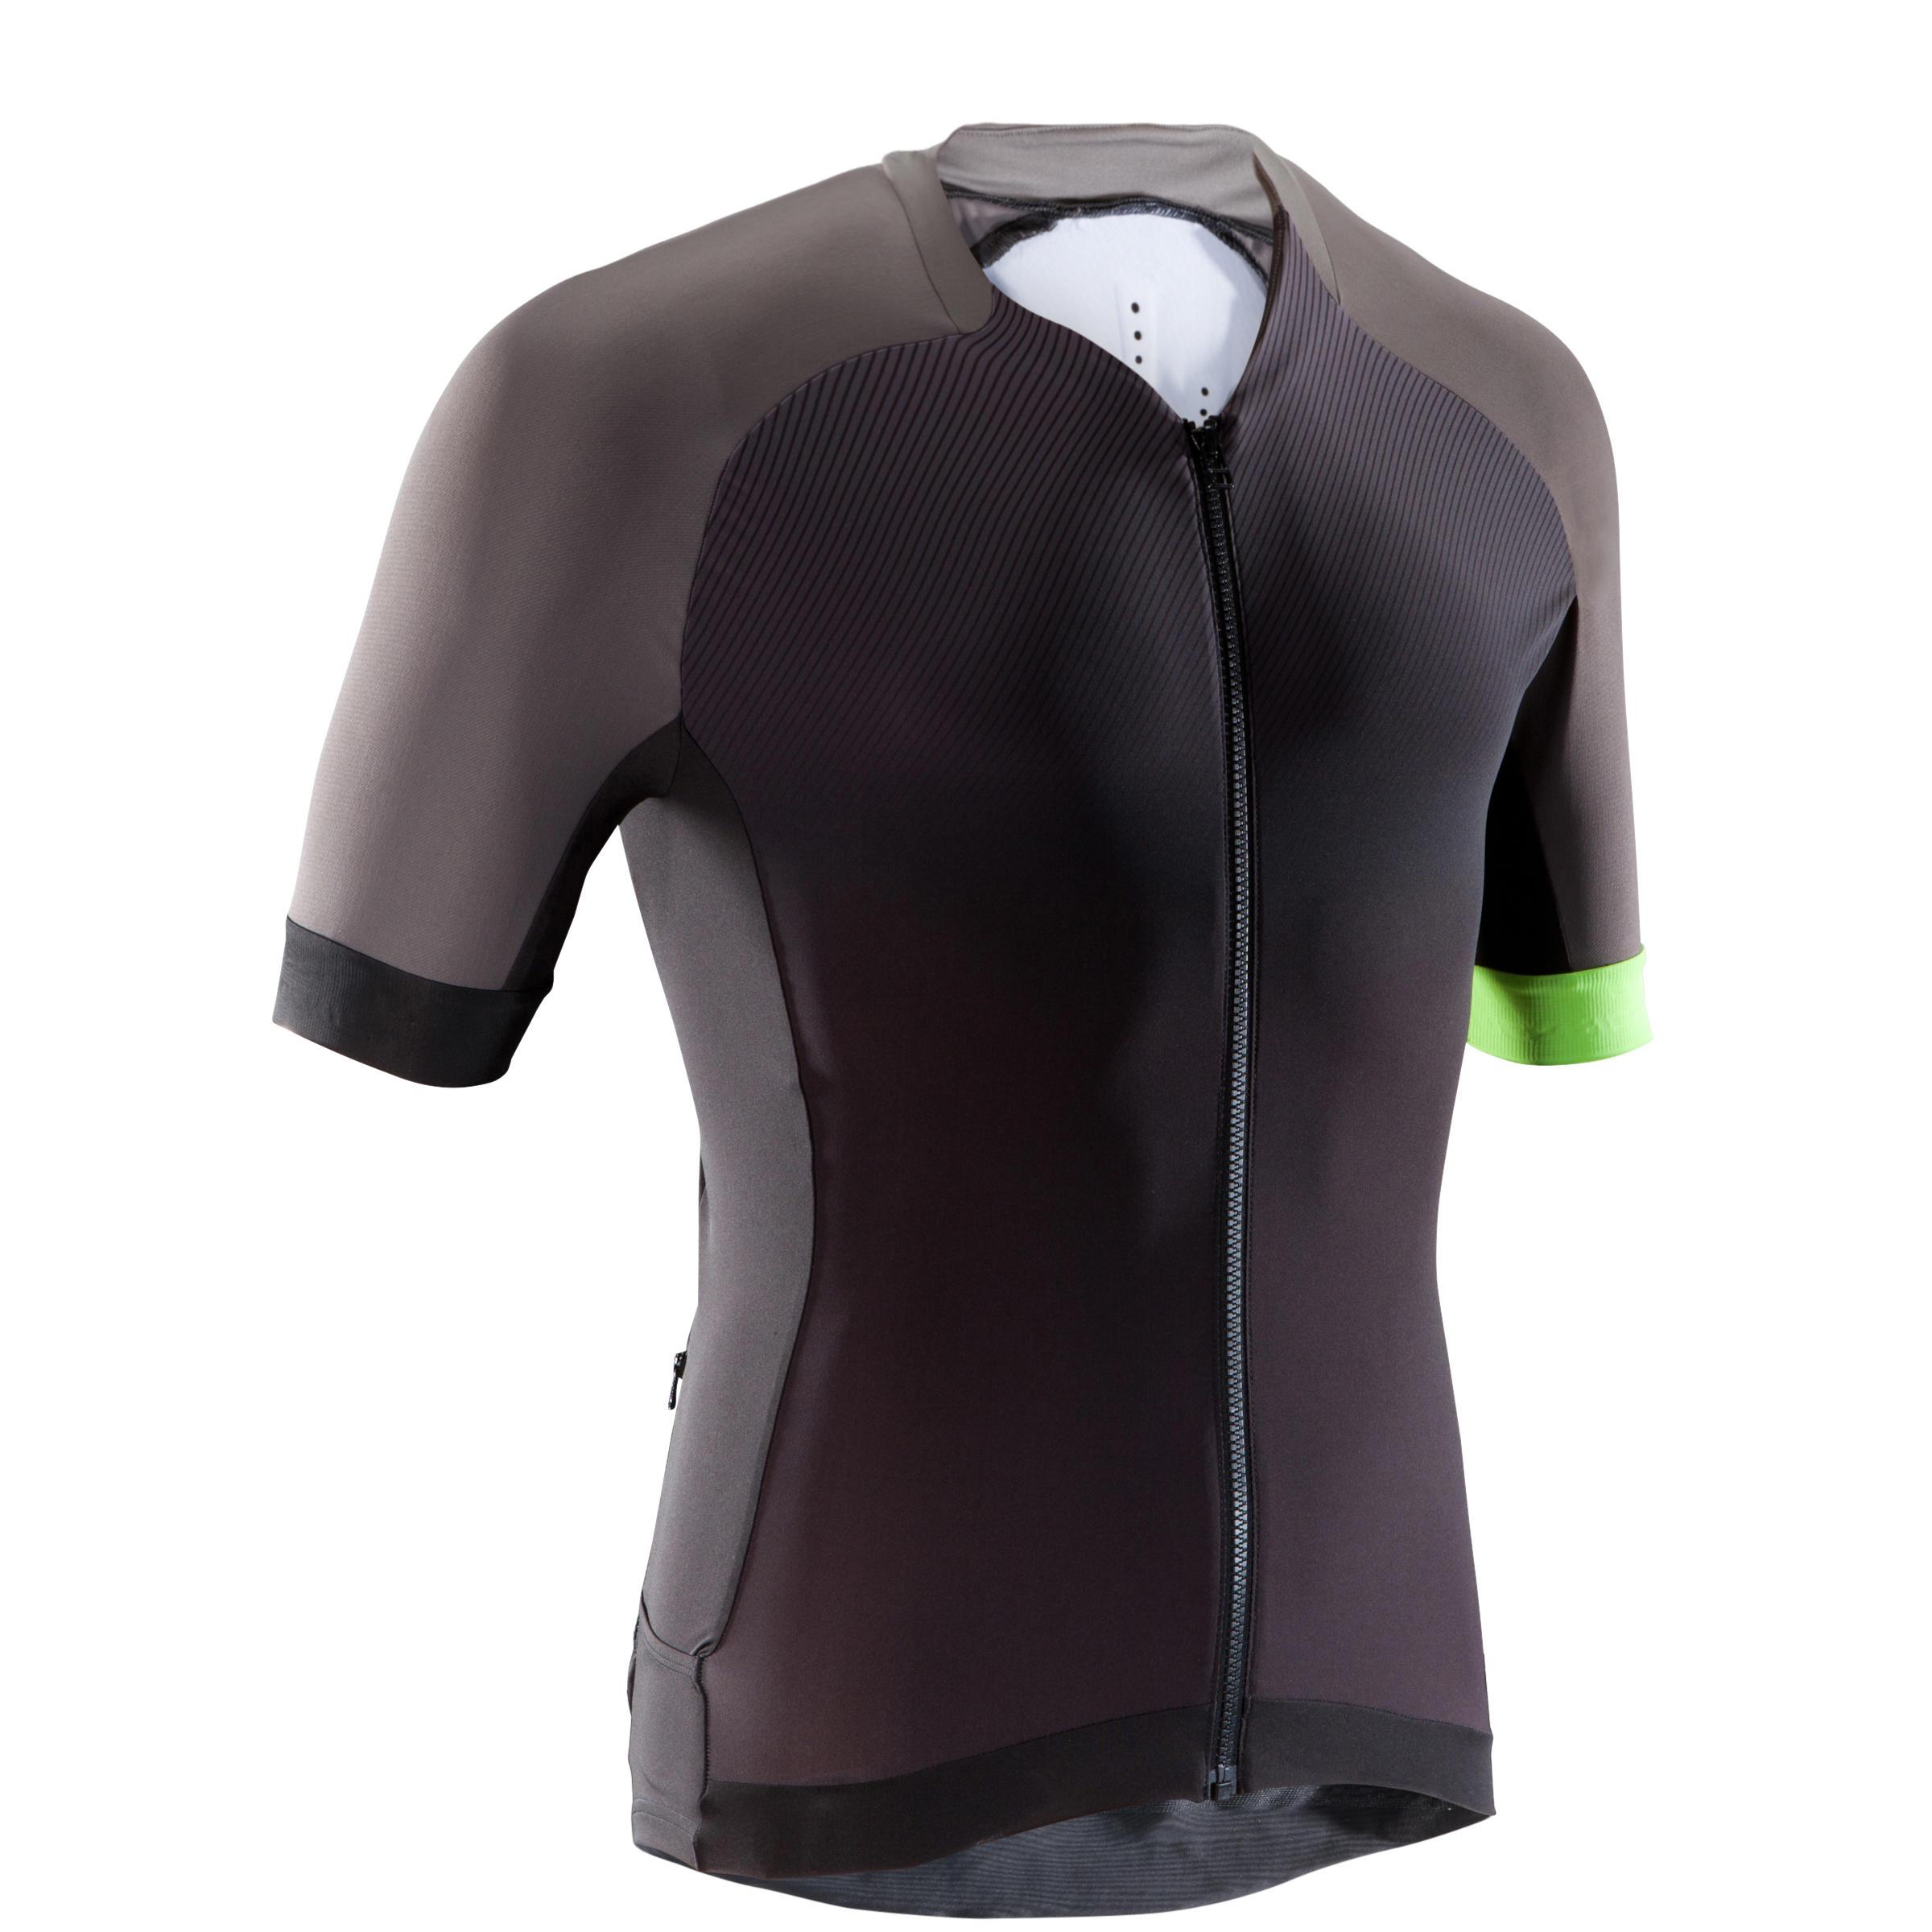 Fahrradtrikot kurzarm MTB XC Light Herren schwarz/grau | Sportbekleidung > Trikots > Fahrradtrikots | Schwarz - Grau - Gelb | Trikot | Rockrider